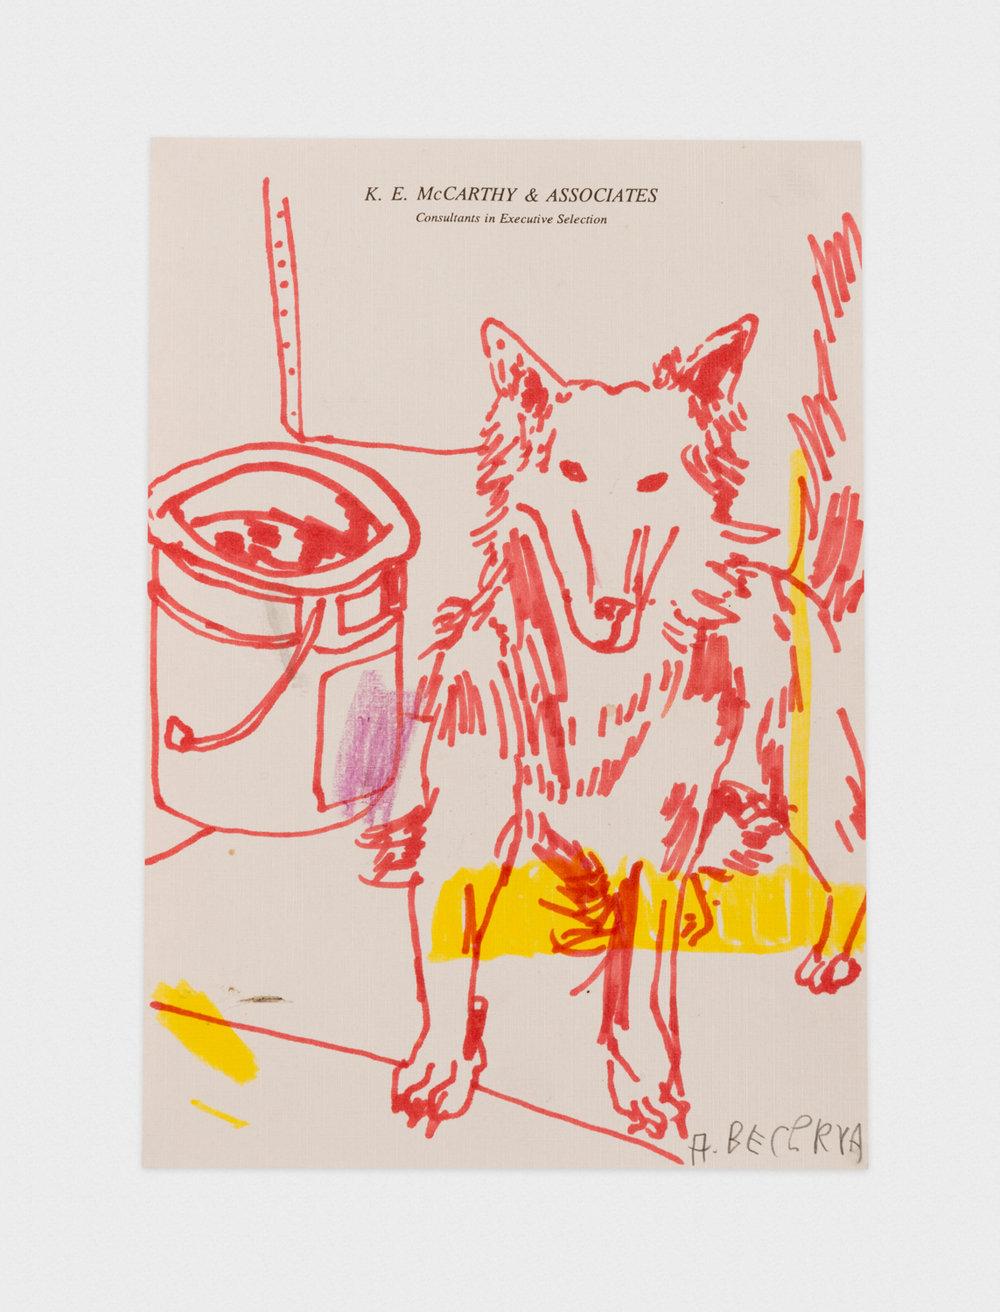 Alex Becerra Thirsty Fletch 2016 Marker on paper 9 x 7 in (22.86h x 17.78w cm) AB372